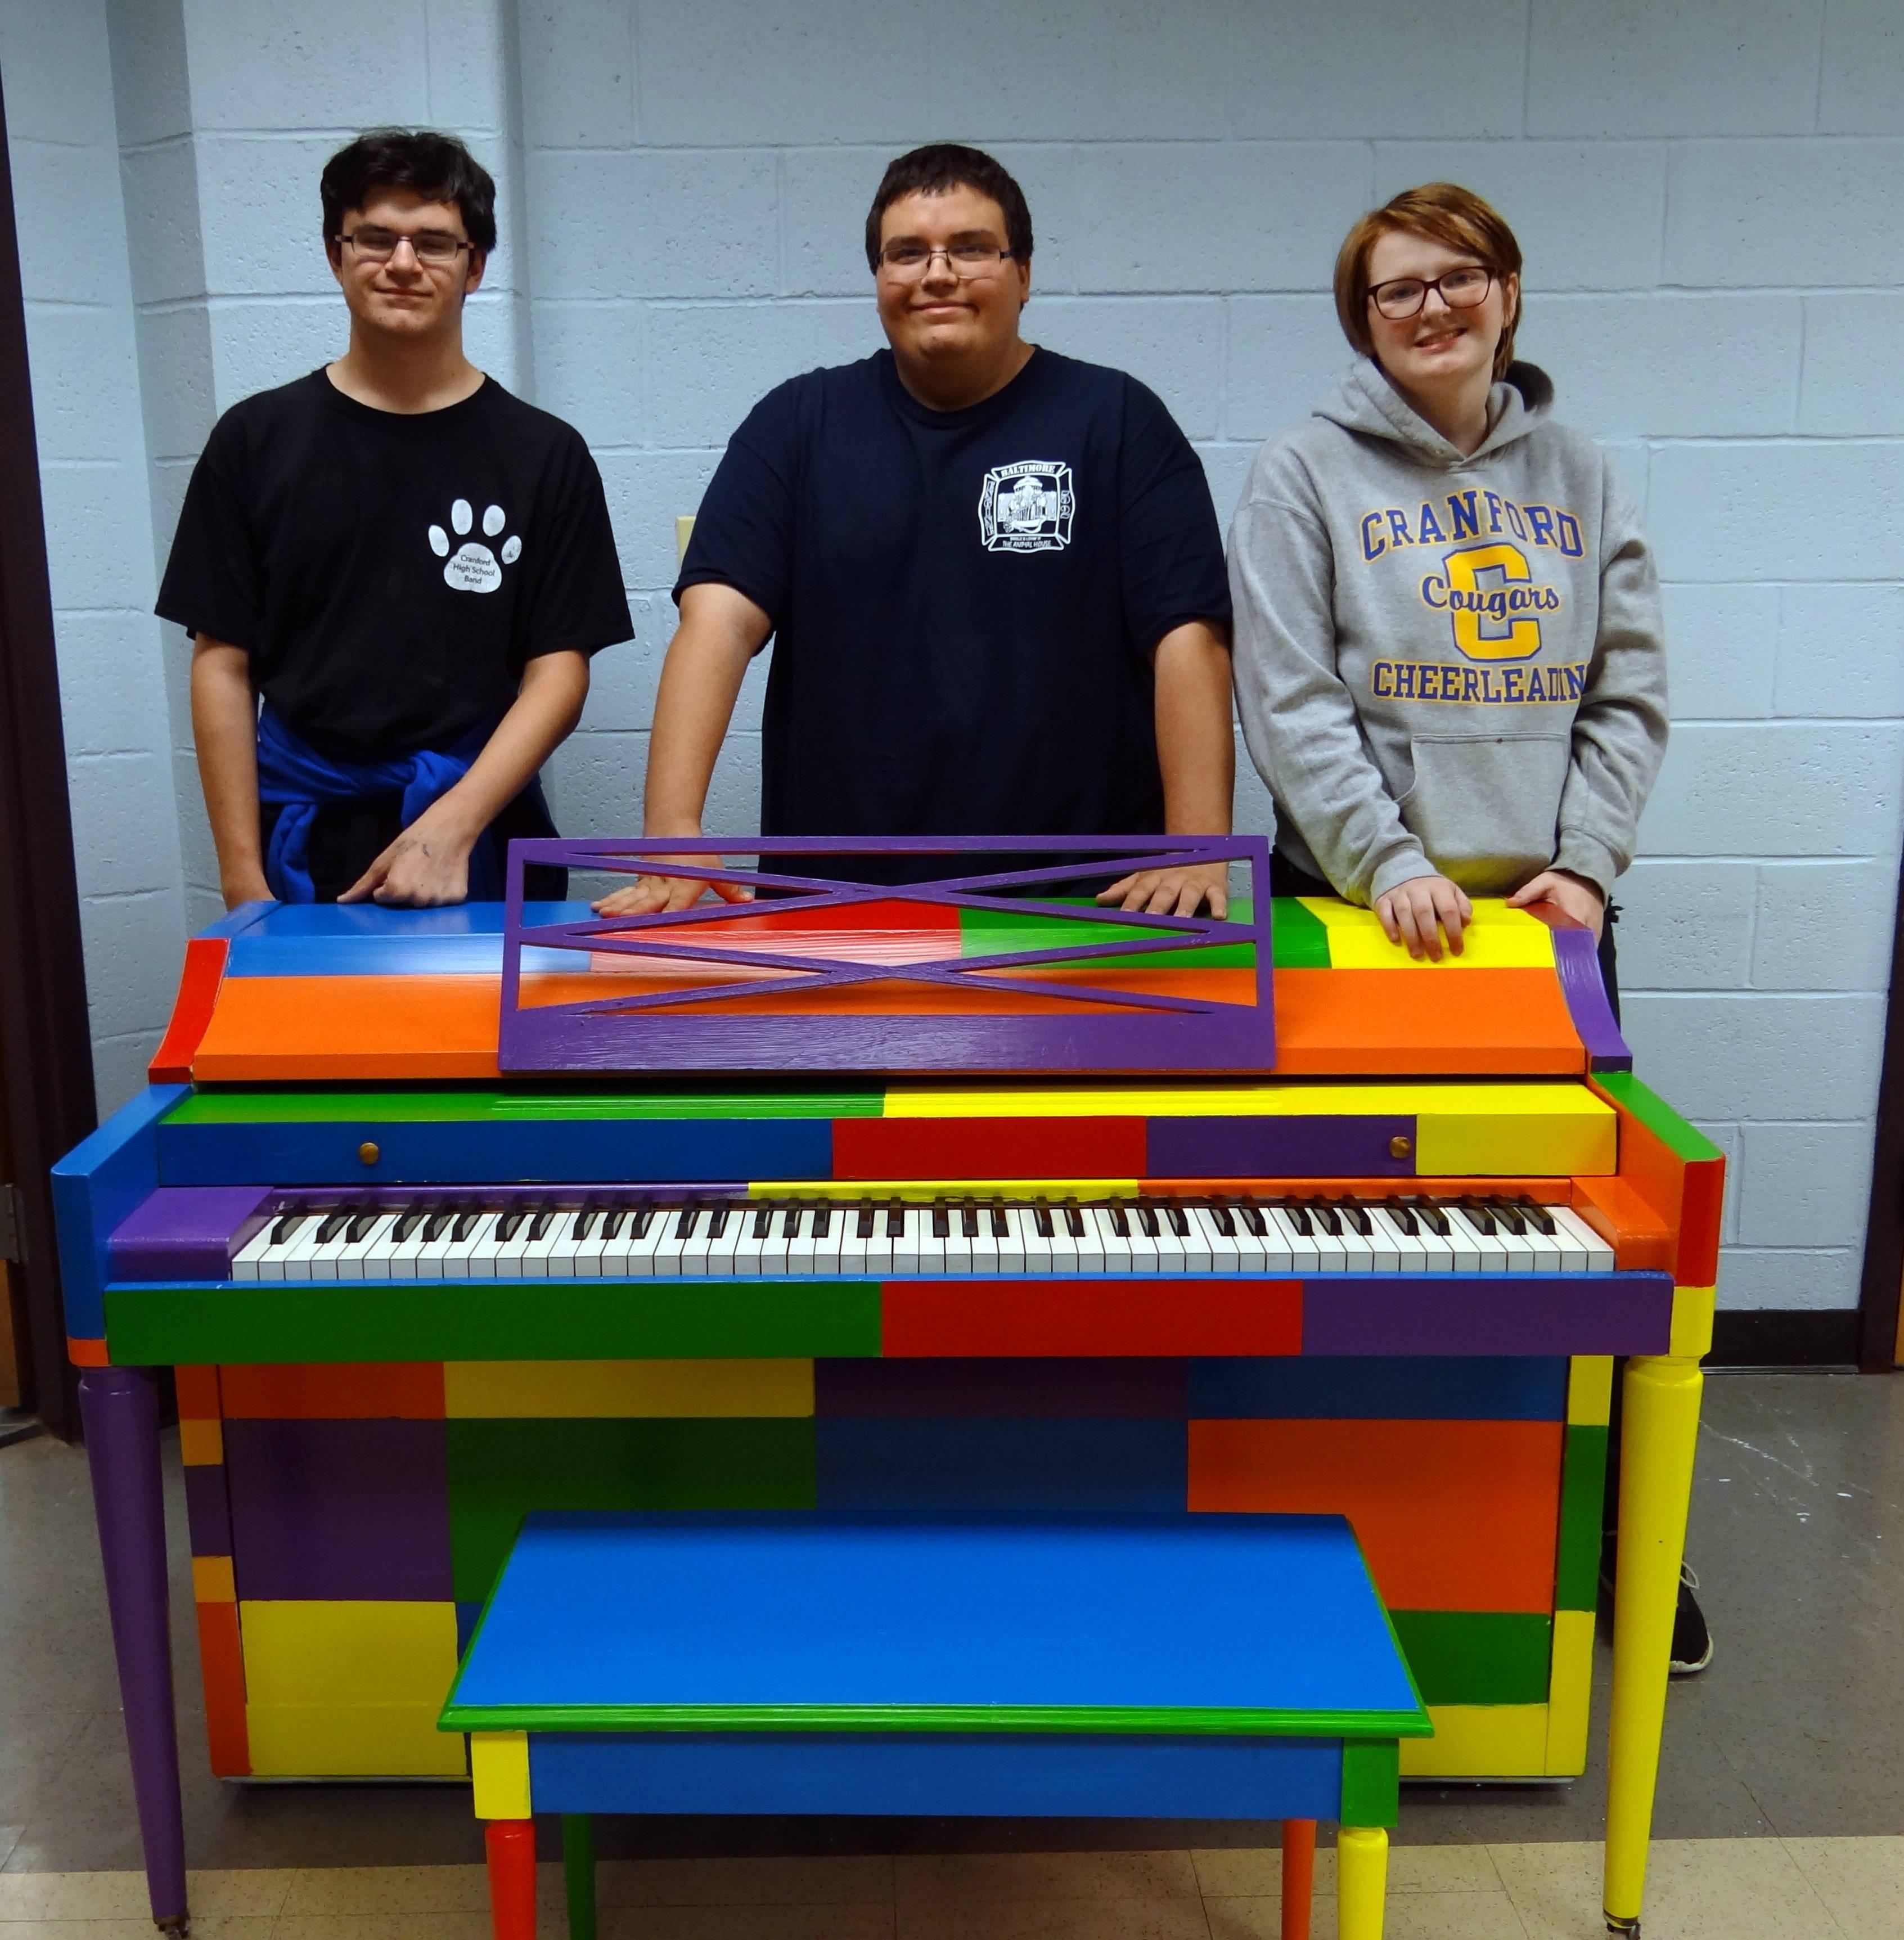 9377c847727f5ef9e10c_Robert_Ben_and_Erin_with_piano.JPG